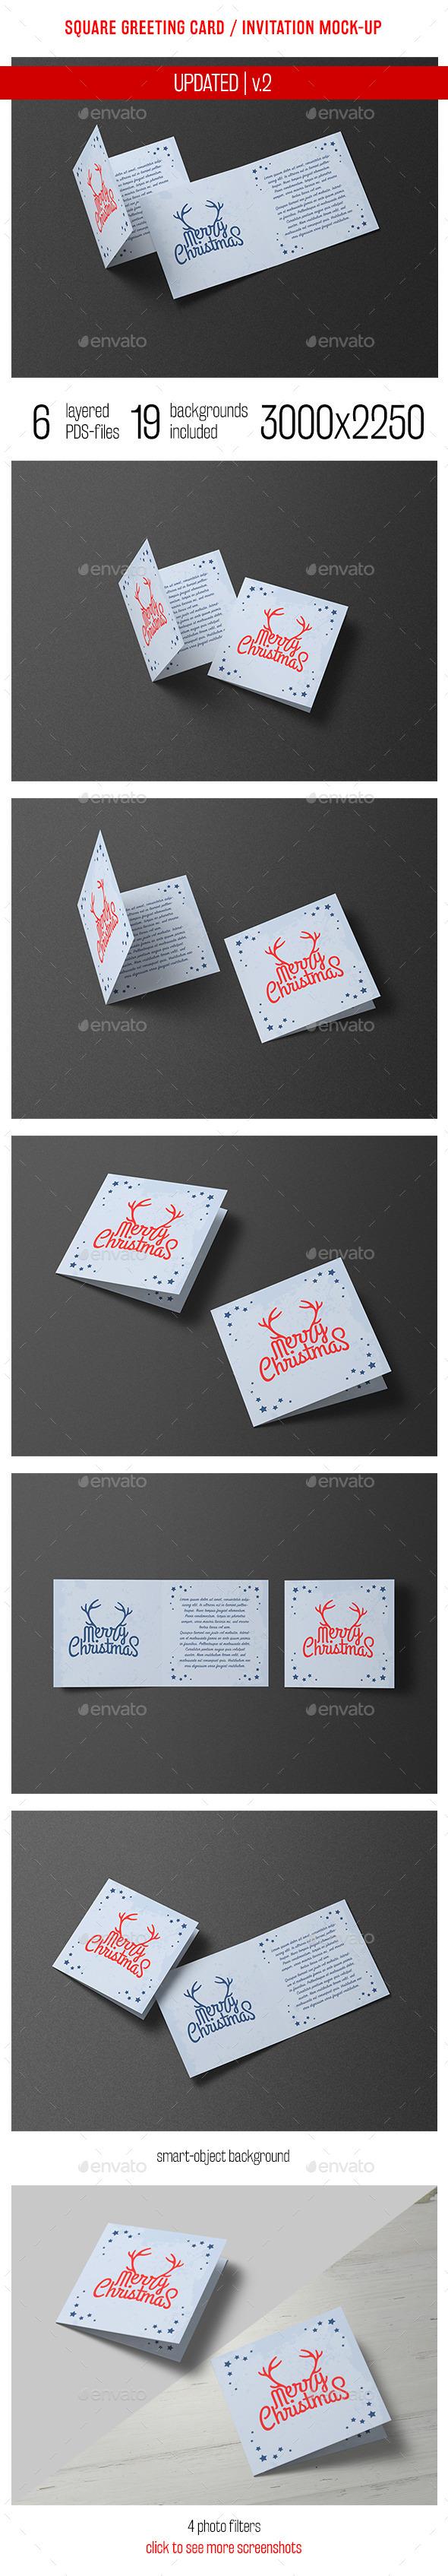 Square Greeting Card and Invitation Mockup - Miscellaneous Print